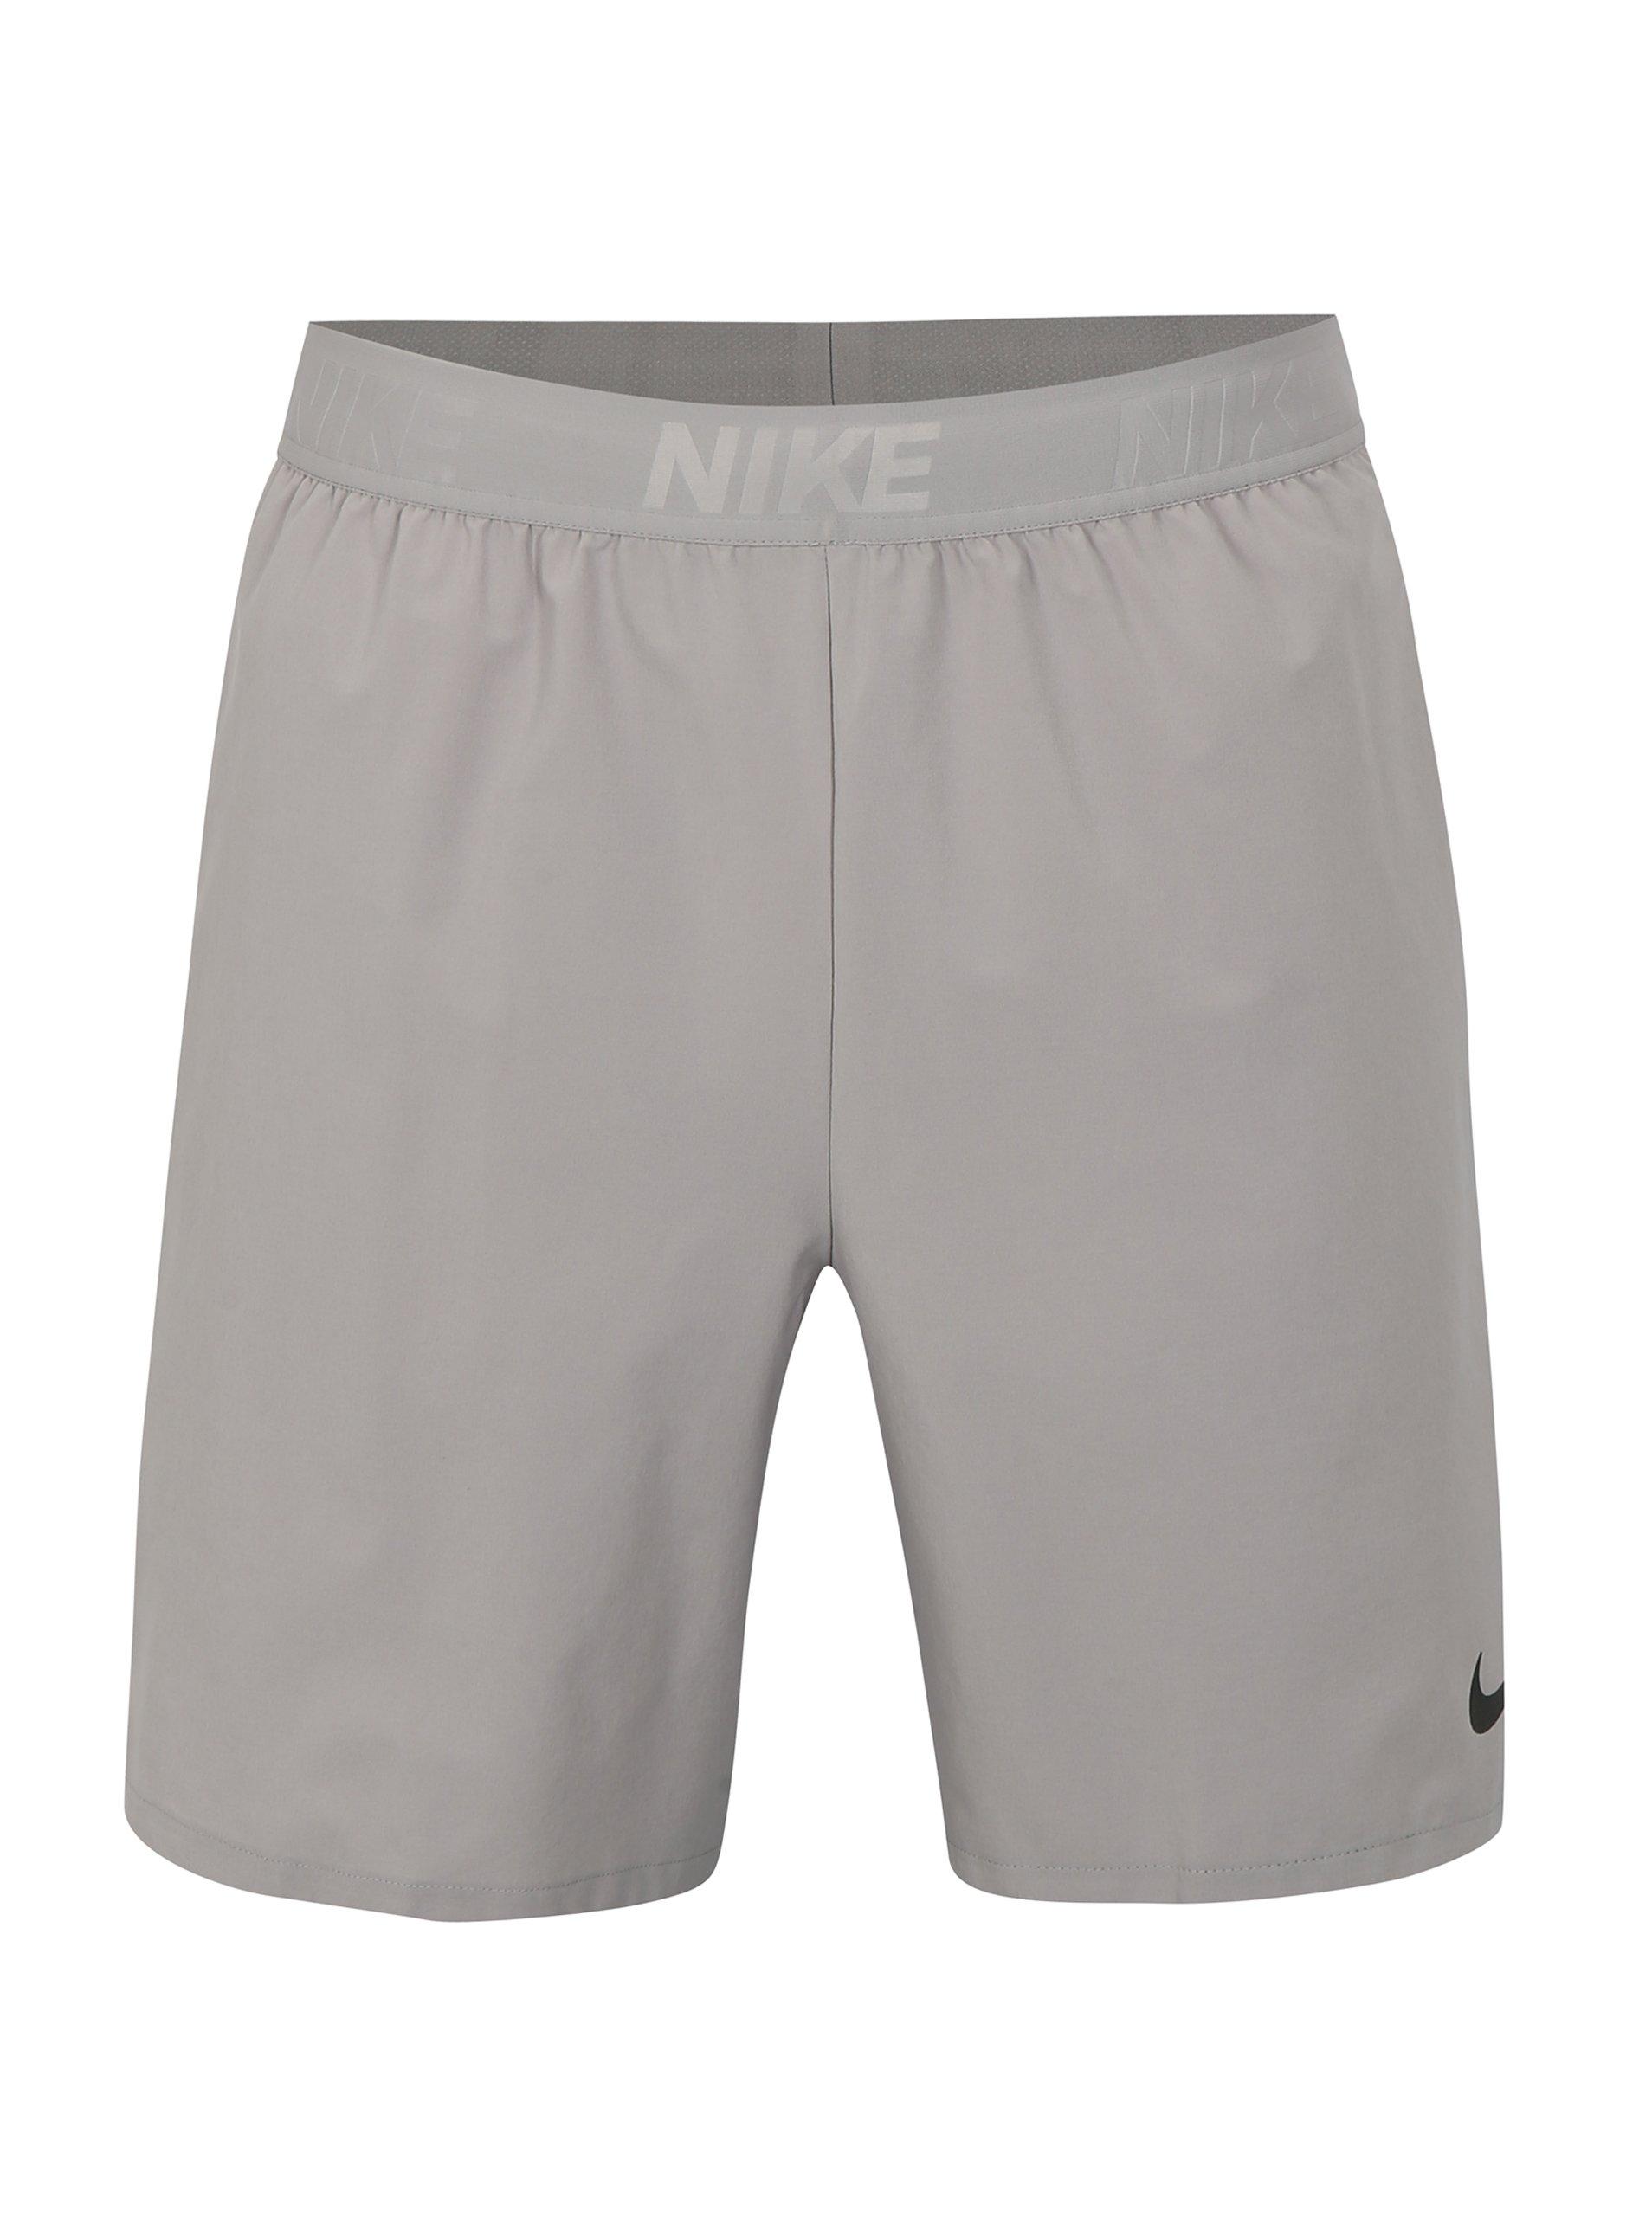 d301e558d223 Sivé pánske standart fit kraťasy Nike Vent Max 2.0